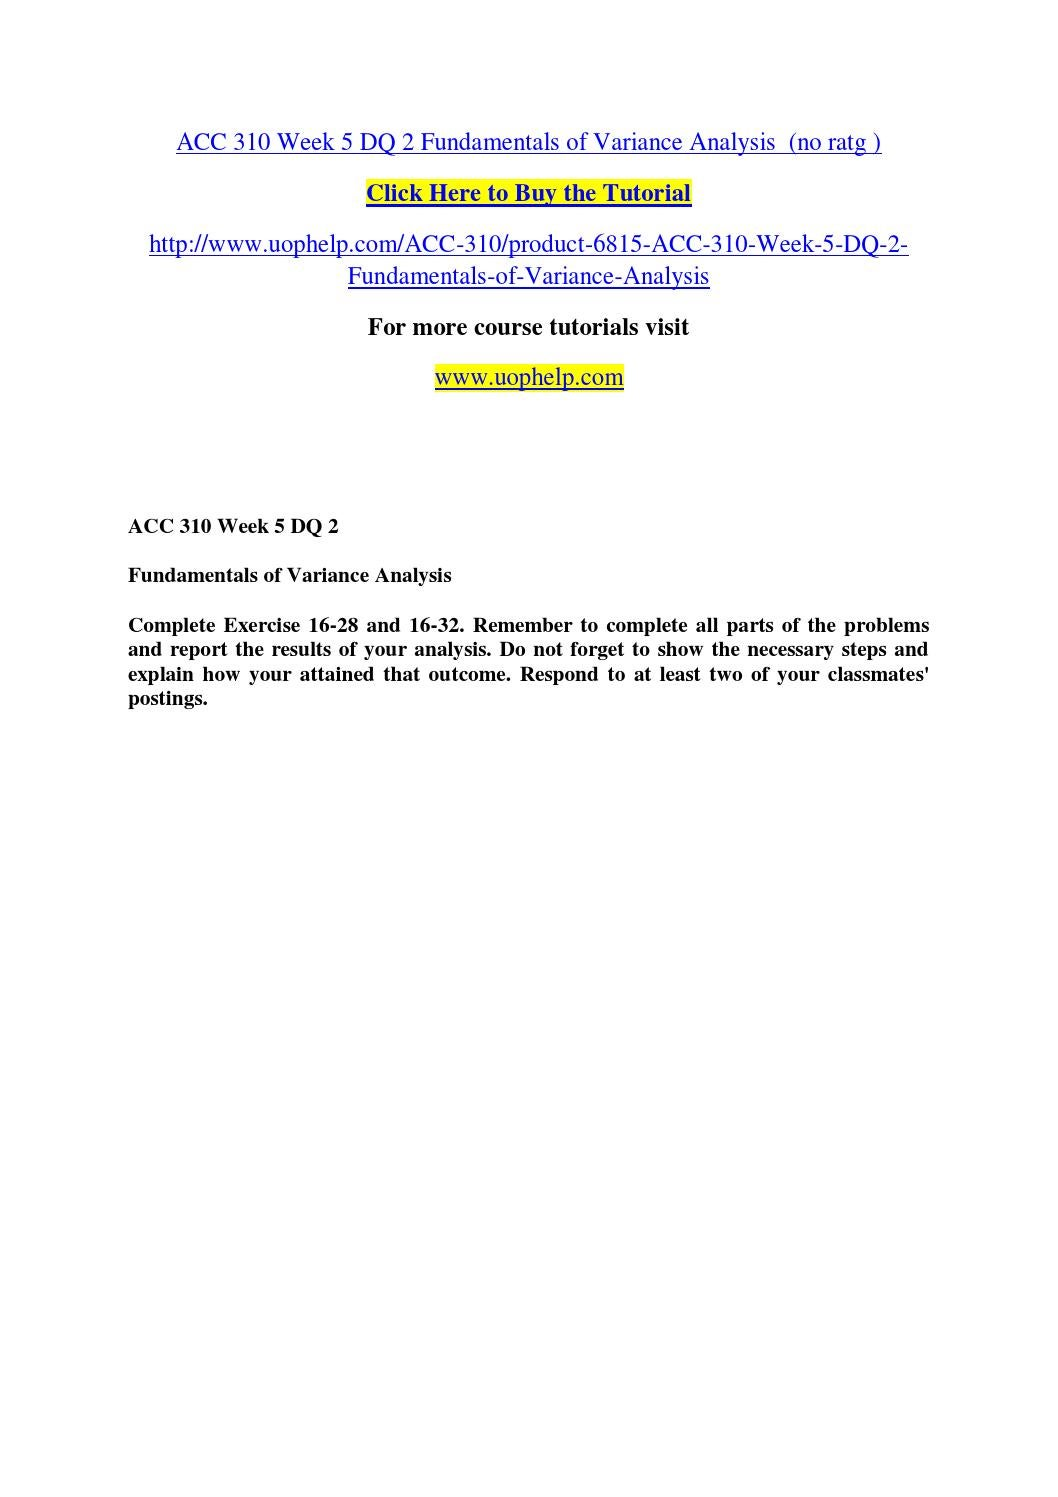 Acc 310 week 5 dq 2 fundamentals of variance analysis (no